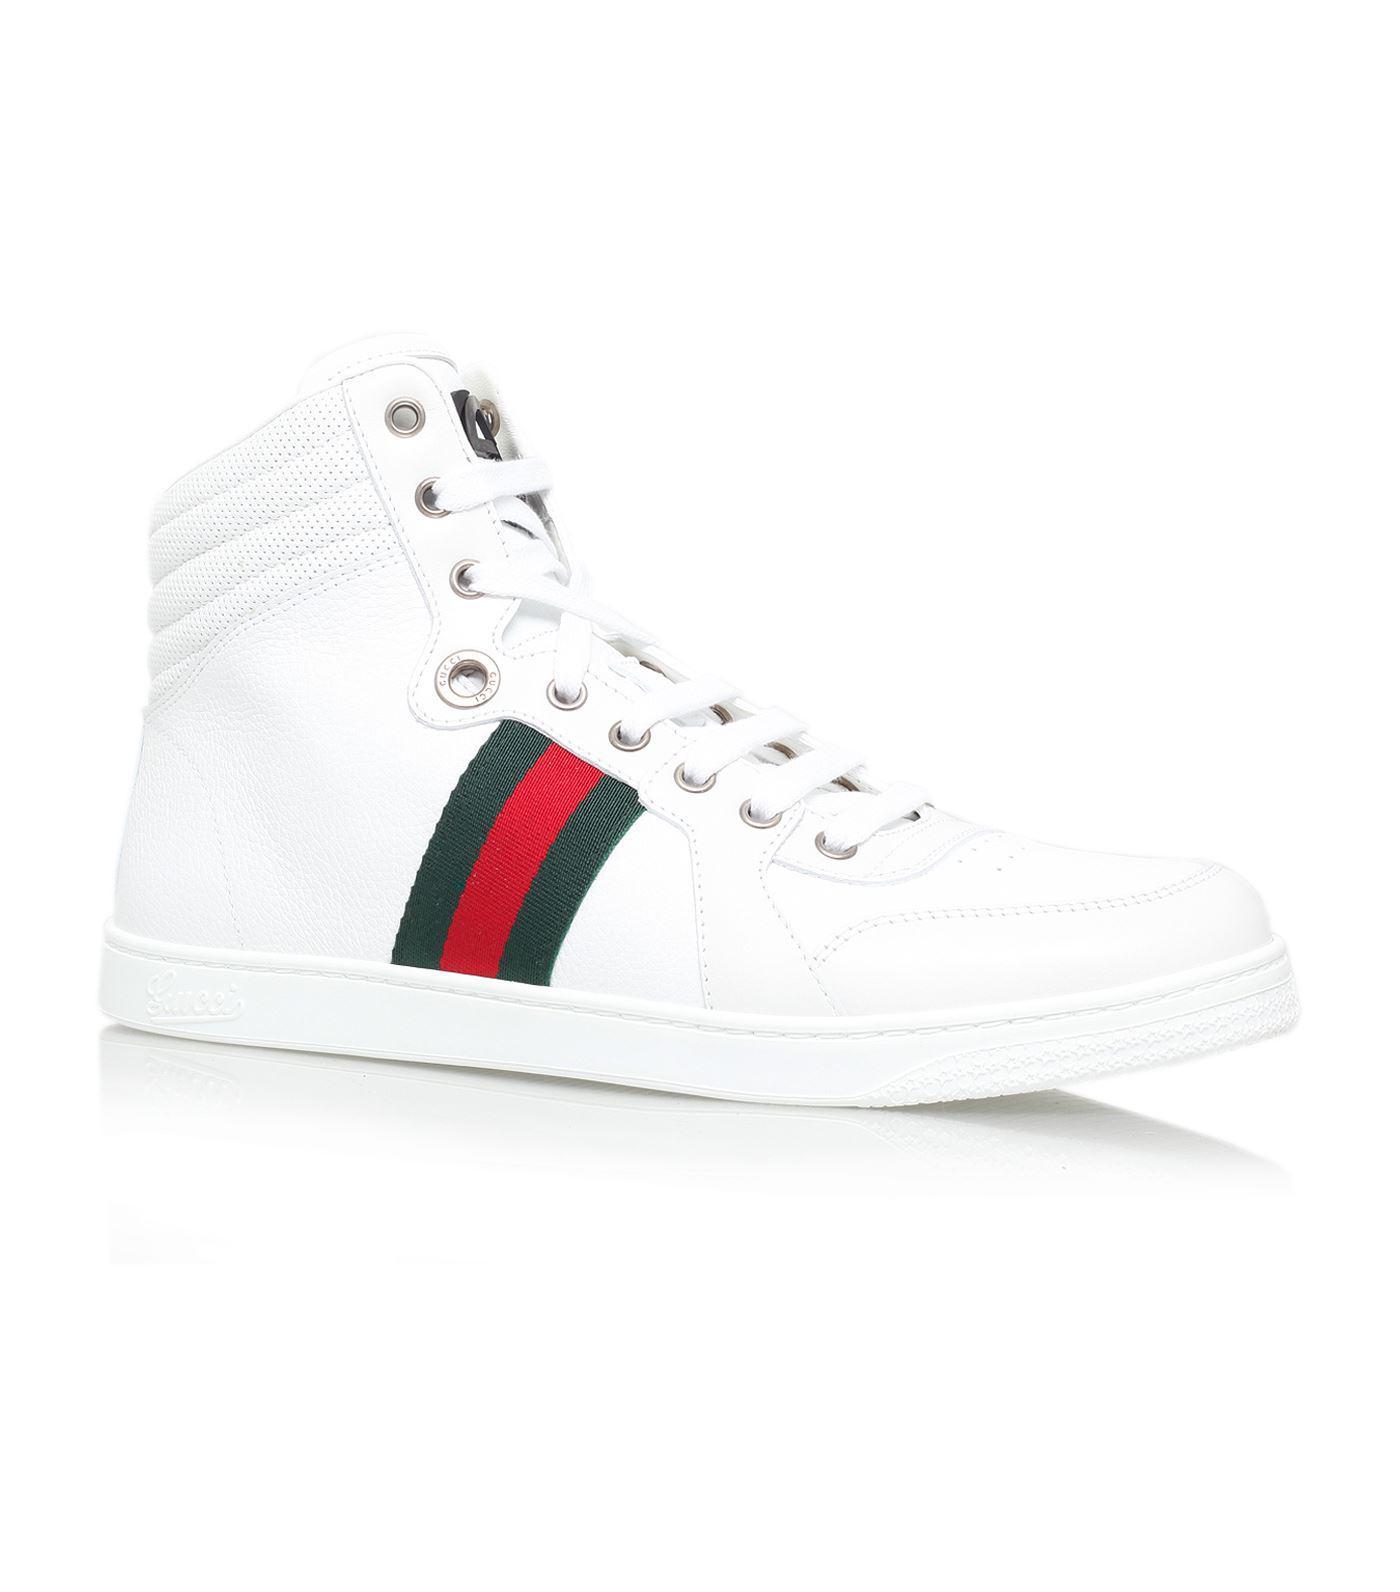 bea80301a6f Lyst - Gucci Coda High-top Sneaker in White for Men